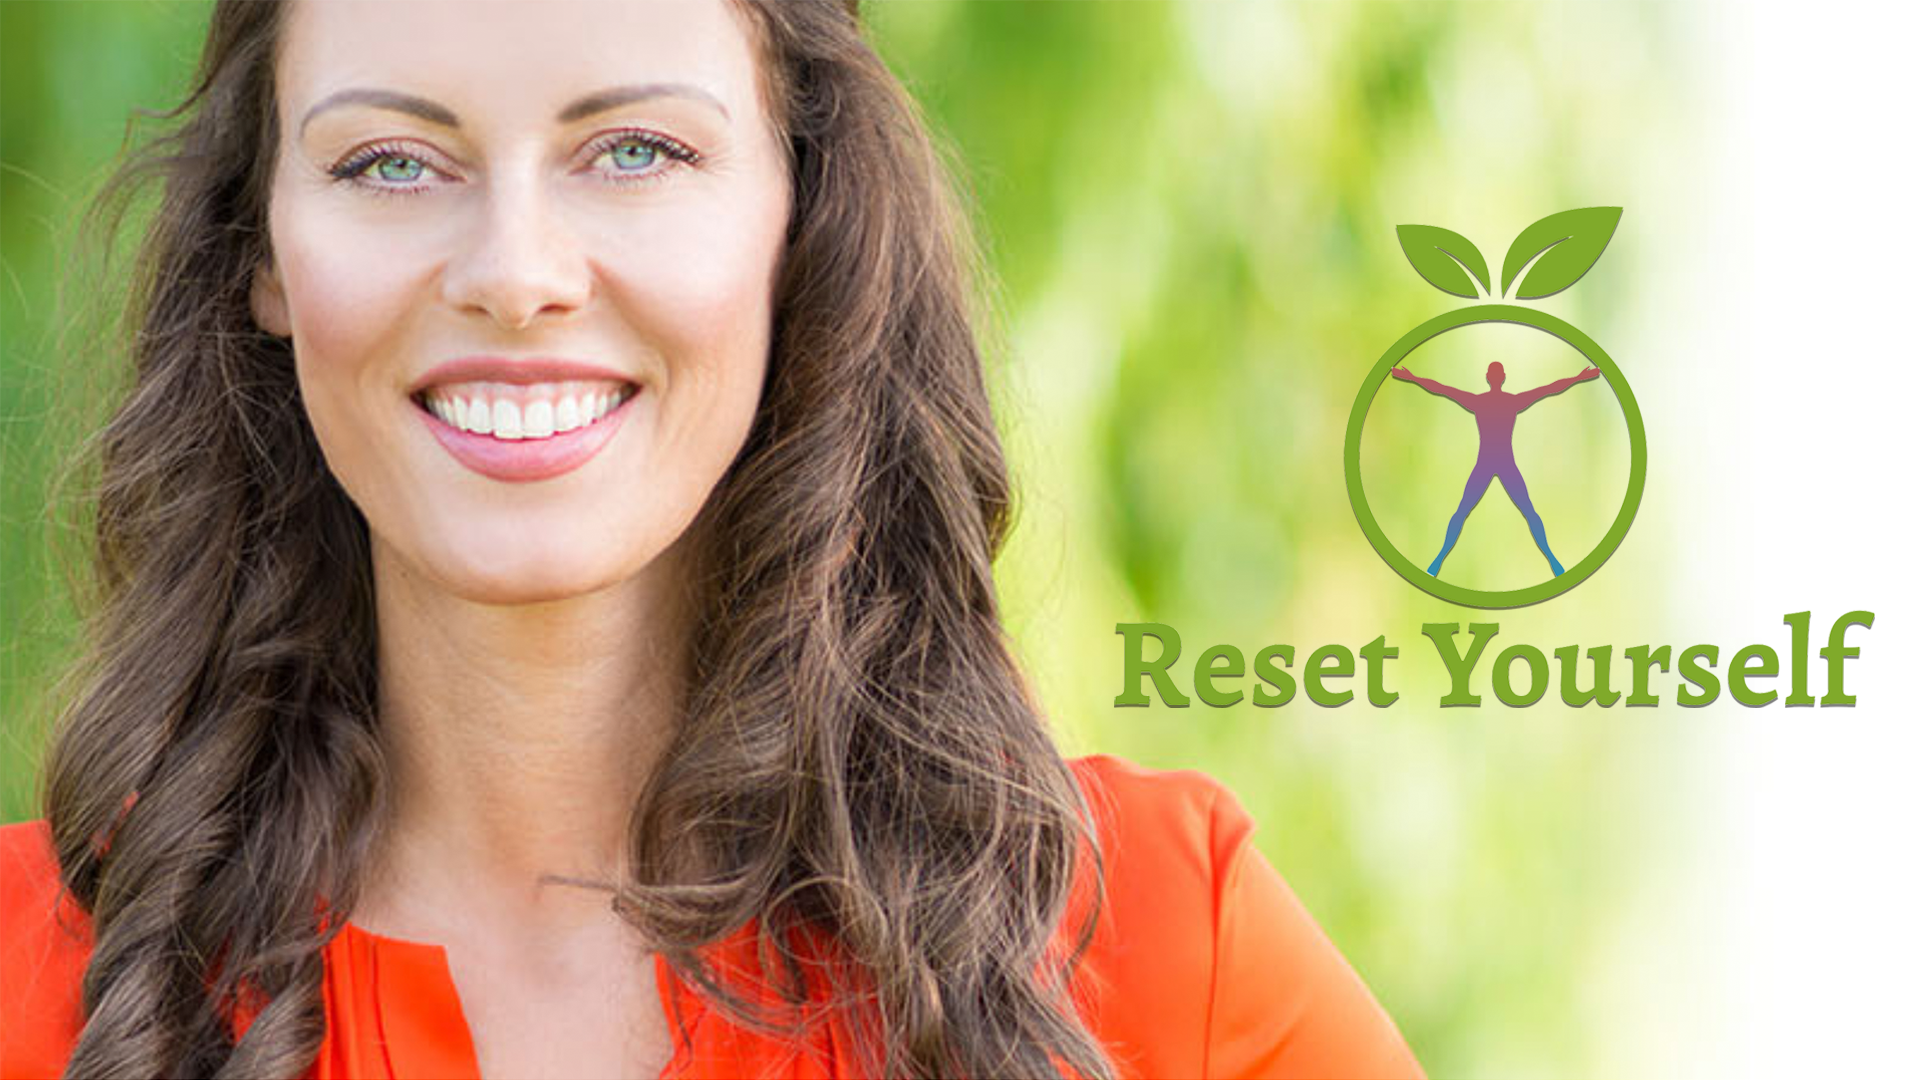 Reset Yourself